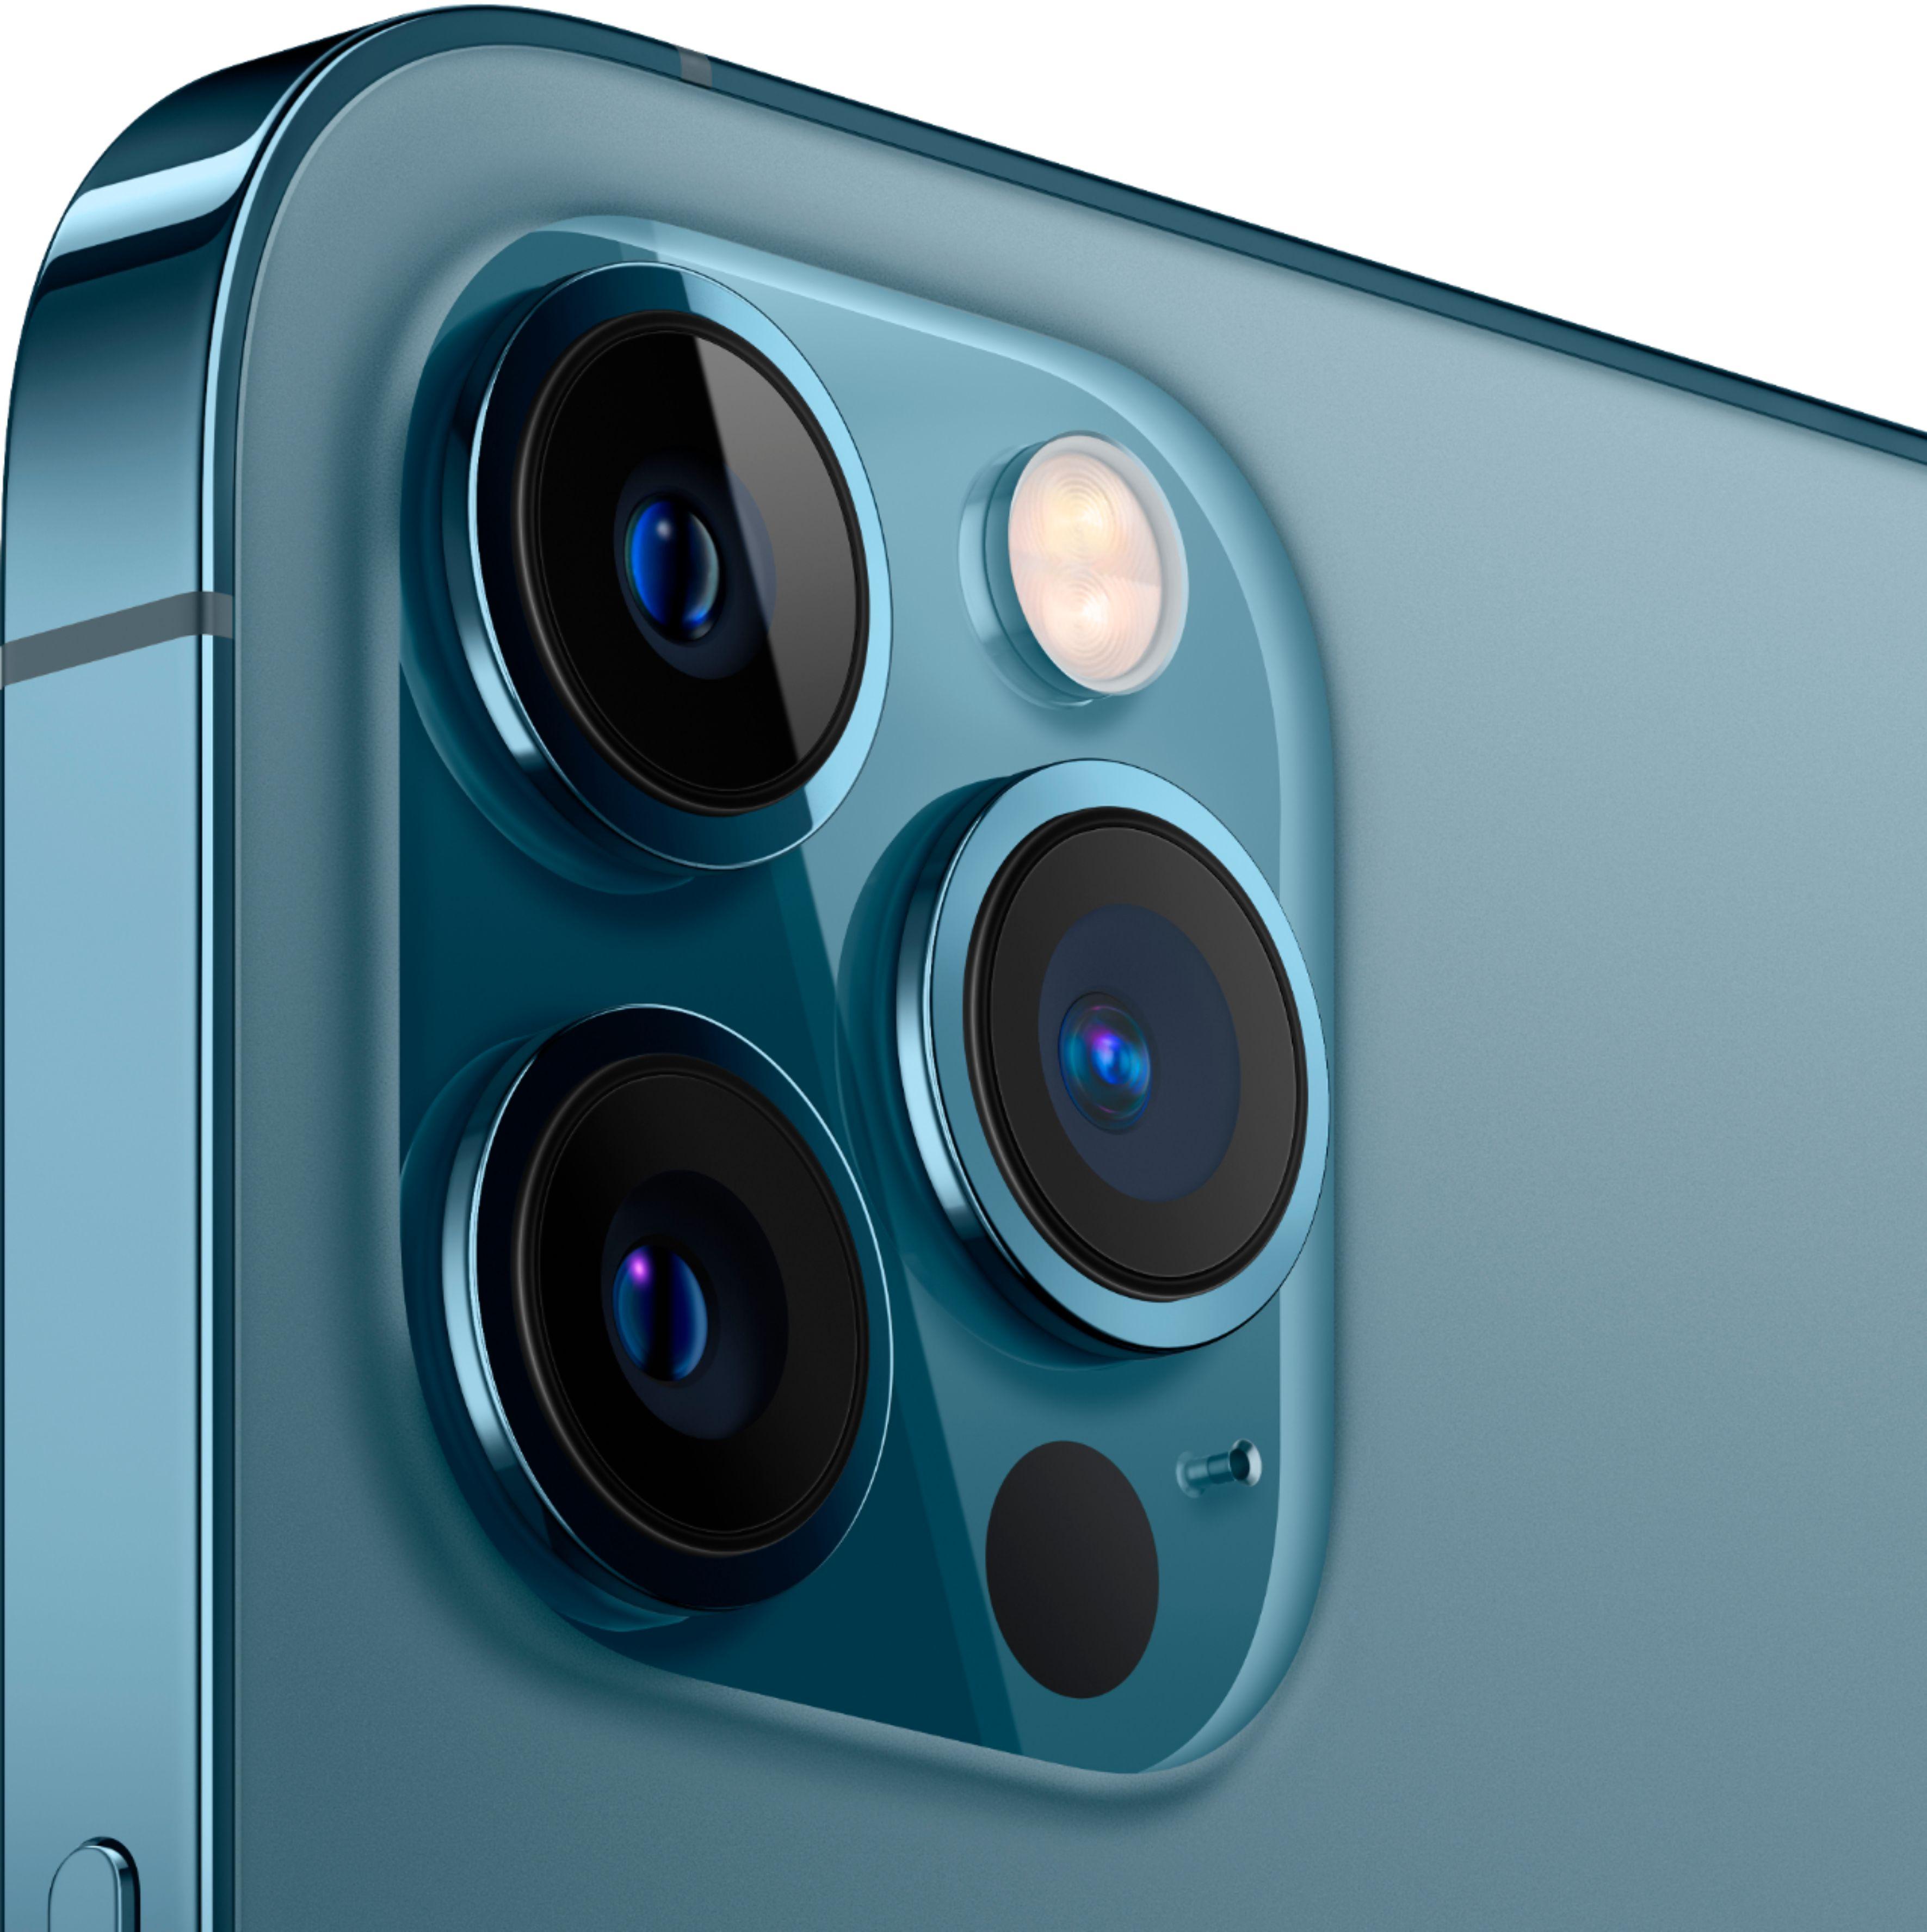 Apple iPhone12 Pro Max 128GB 6 GB RAM, PacificBlue